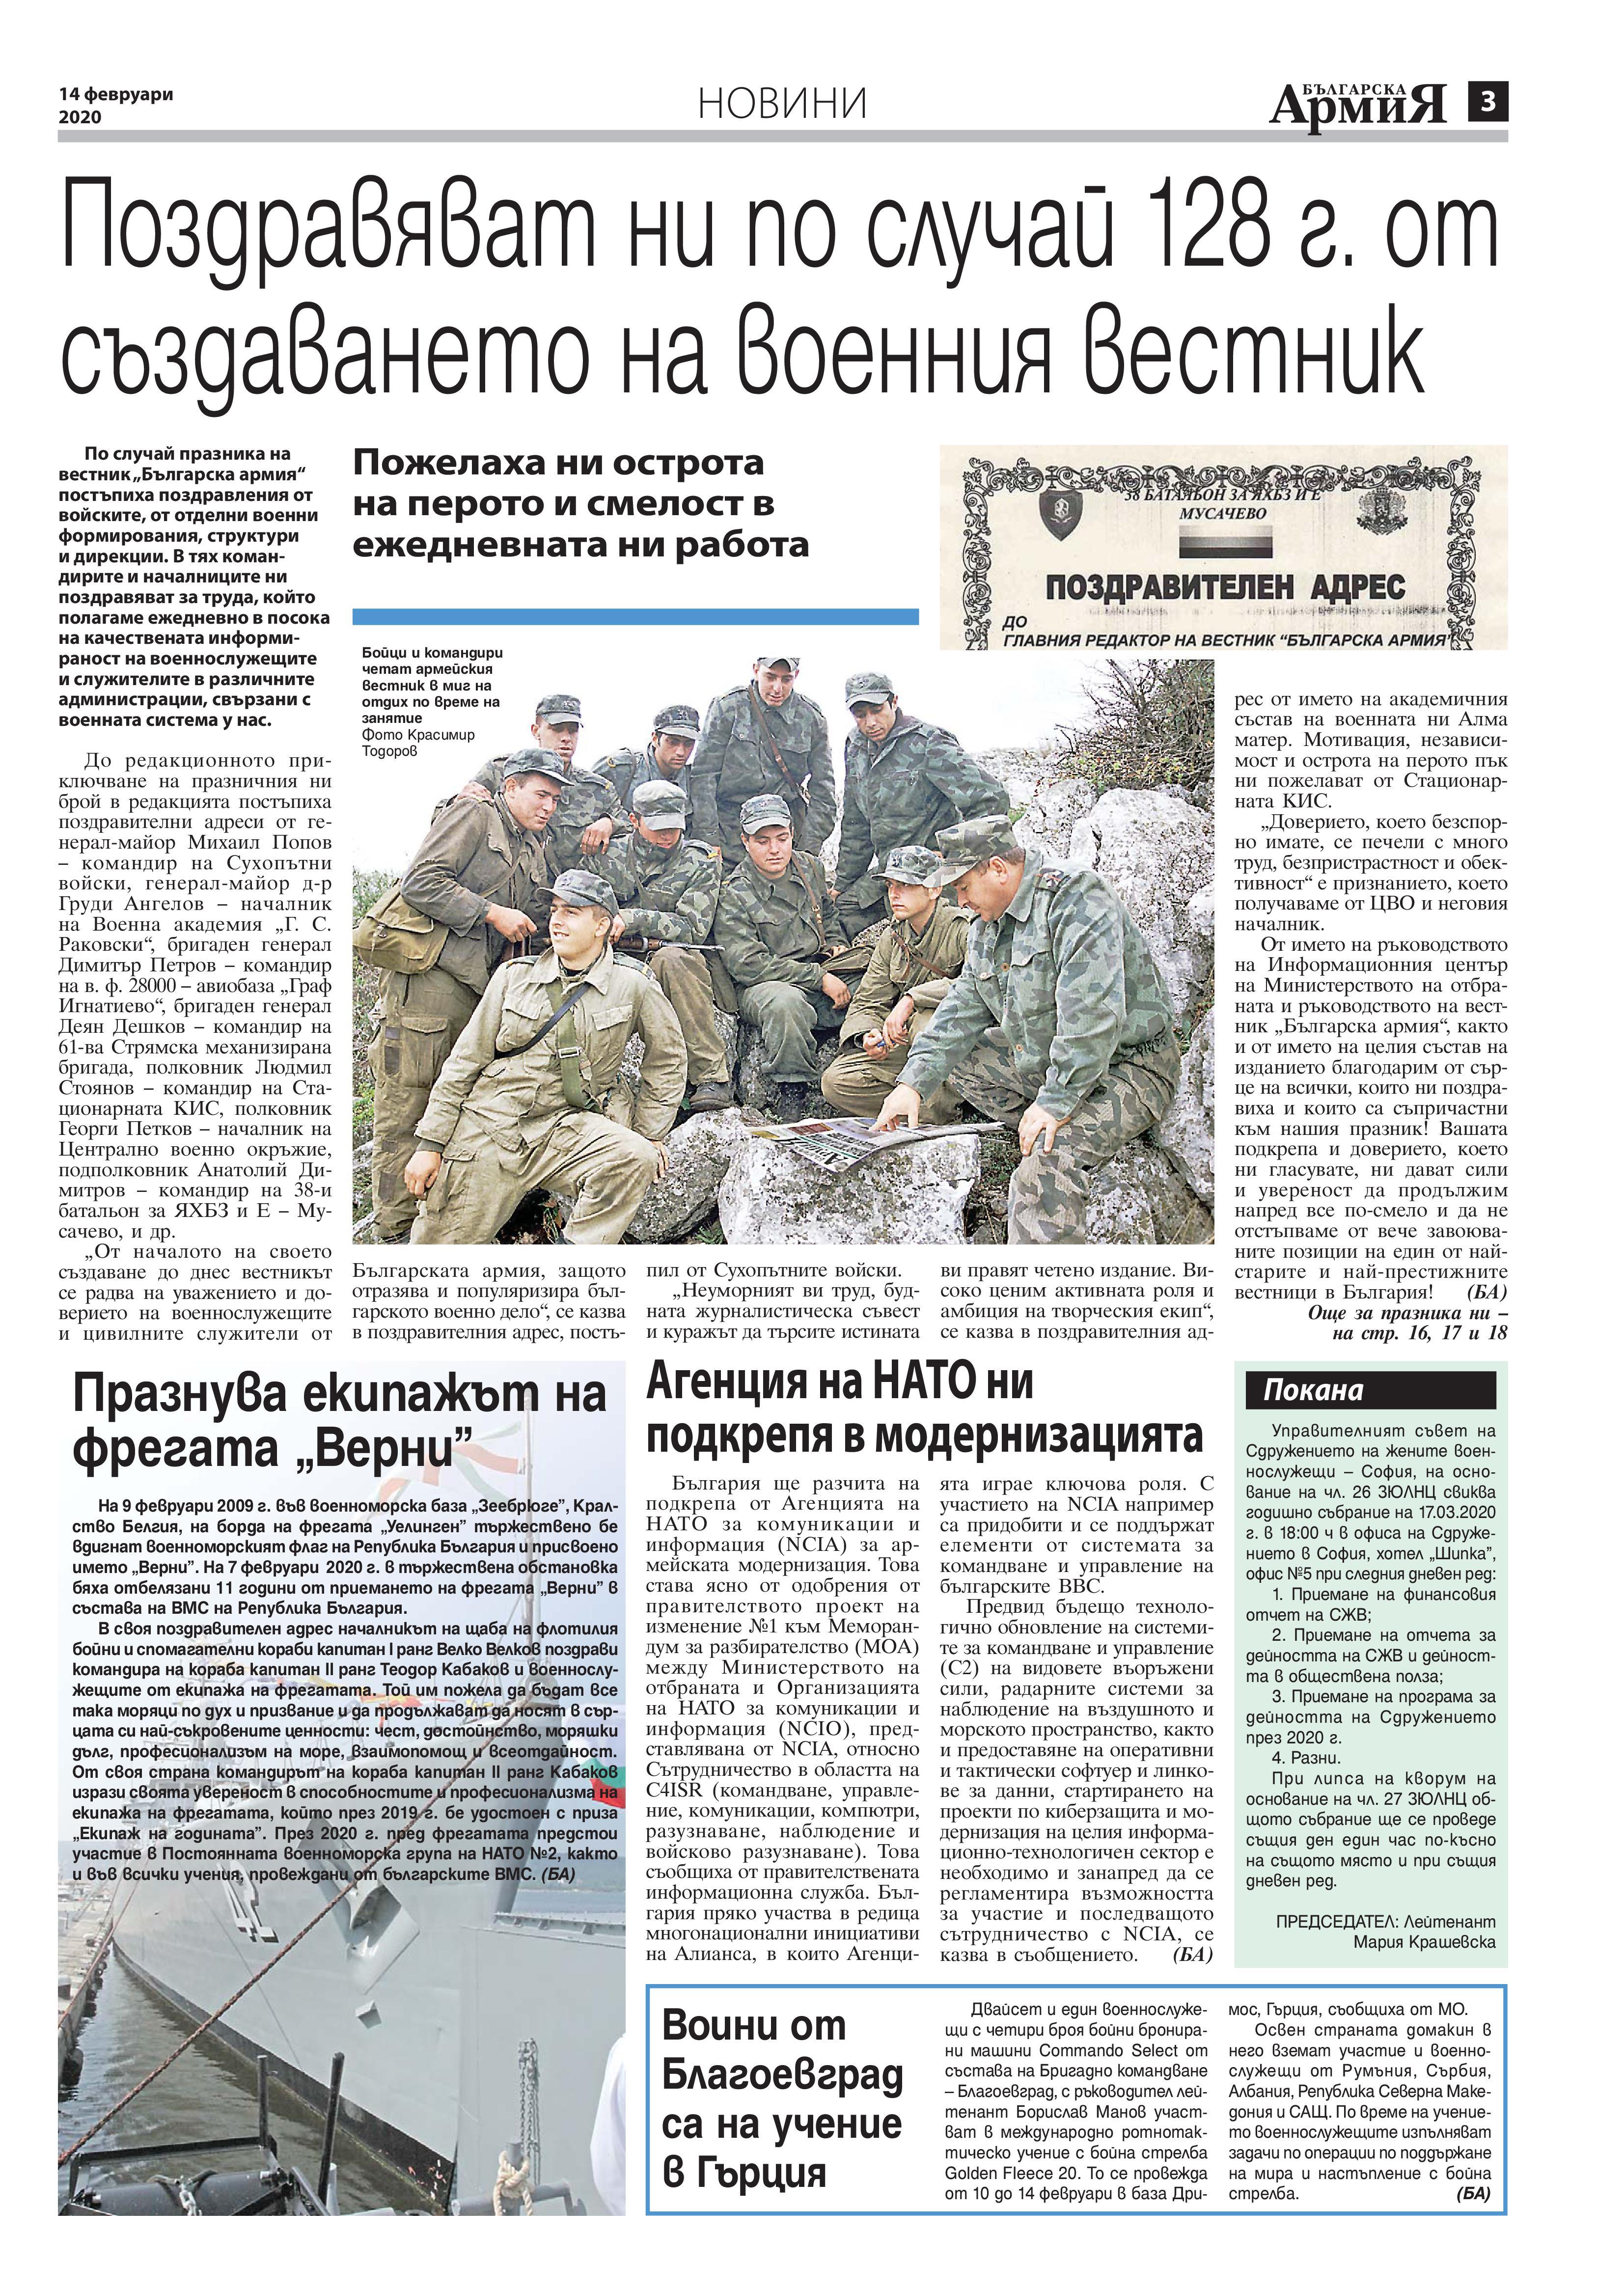 https://www.armymedia.bg/wp-content/uploads/2015/06/03-34.jpg